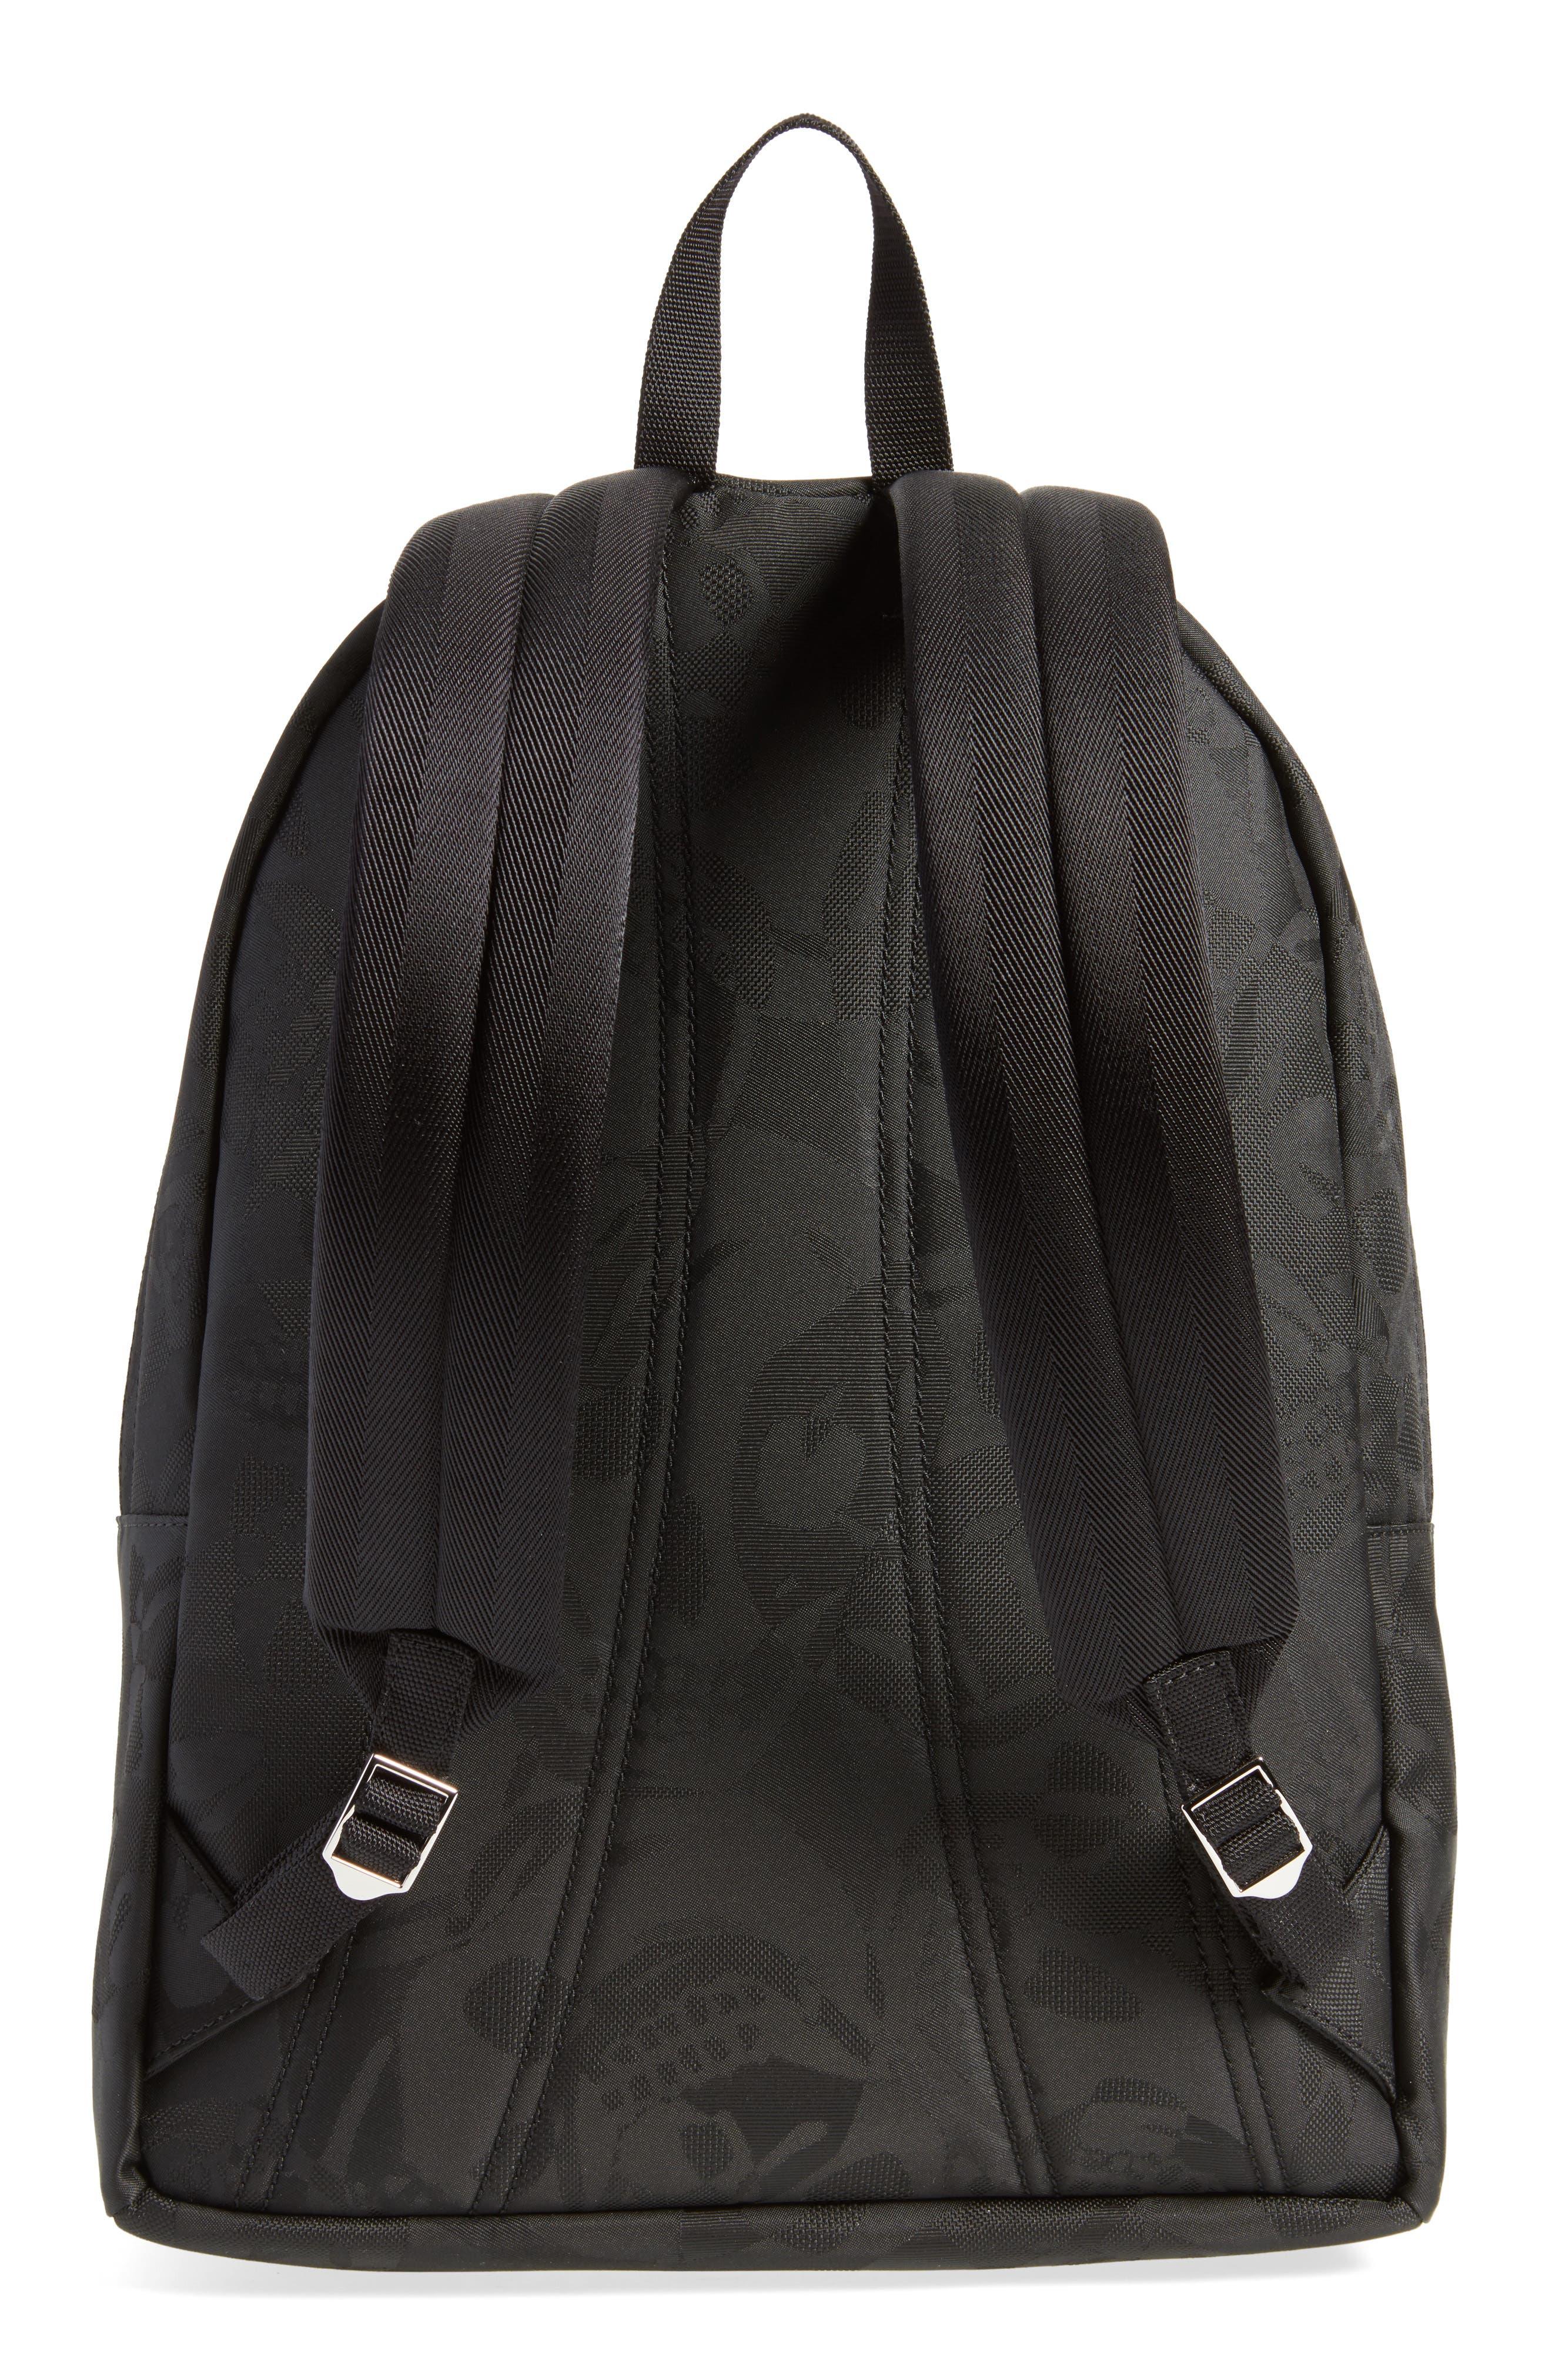 Small Backpack,                             Alternate thumbnail 3, color,                             Black